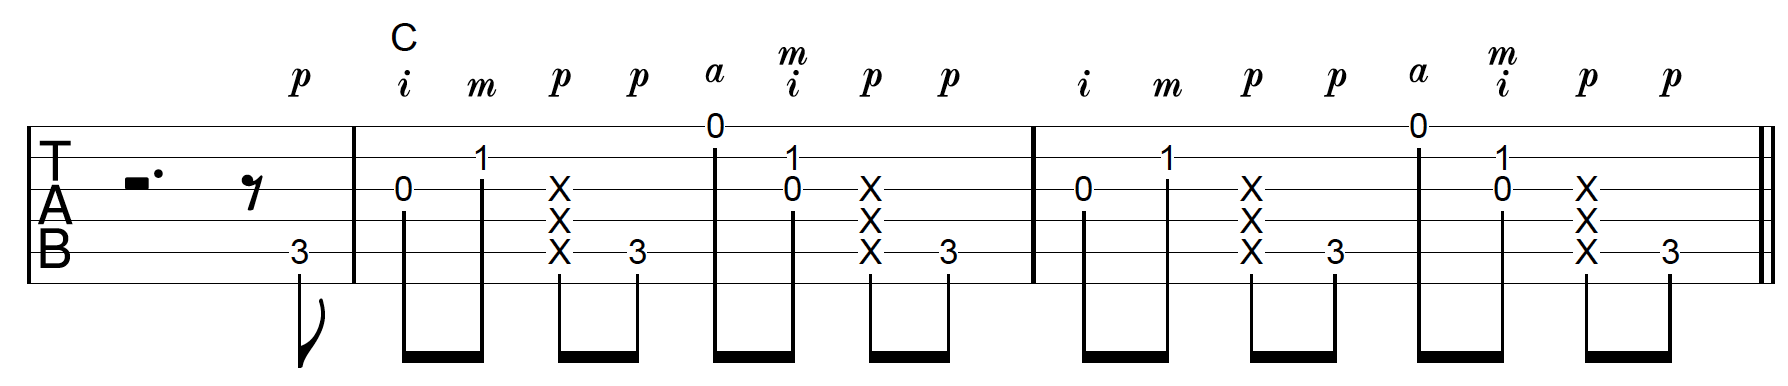 Thumb Slap C Chord Pattern 2